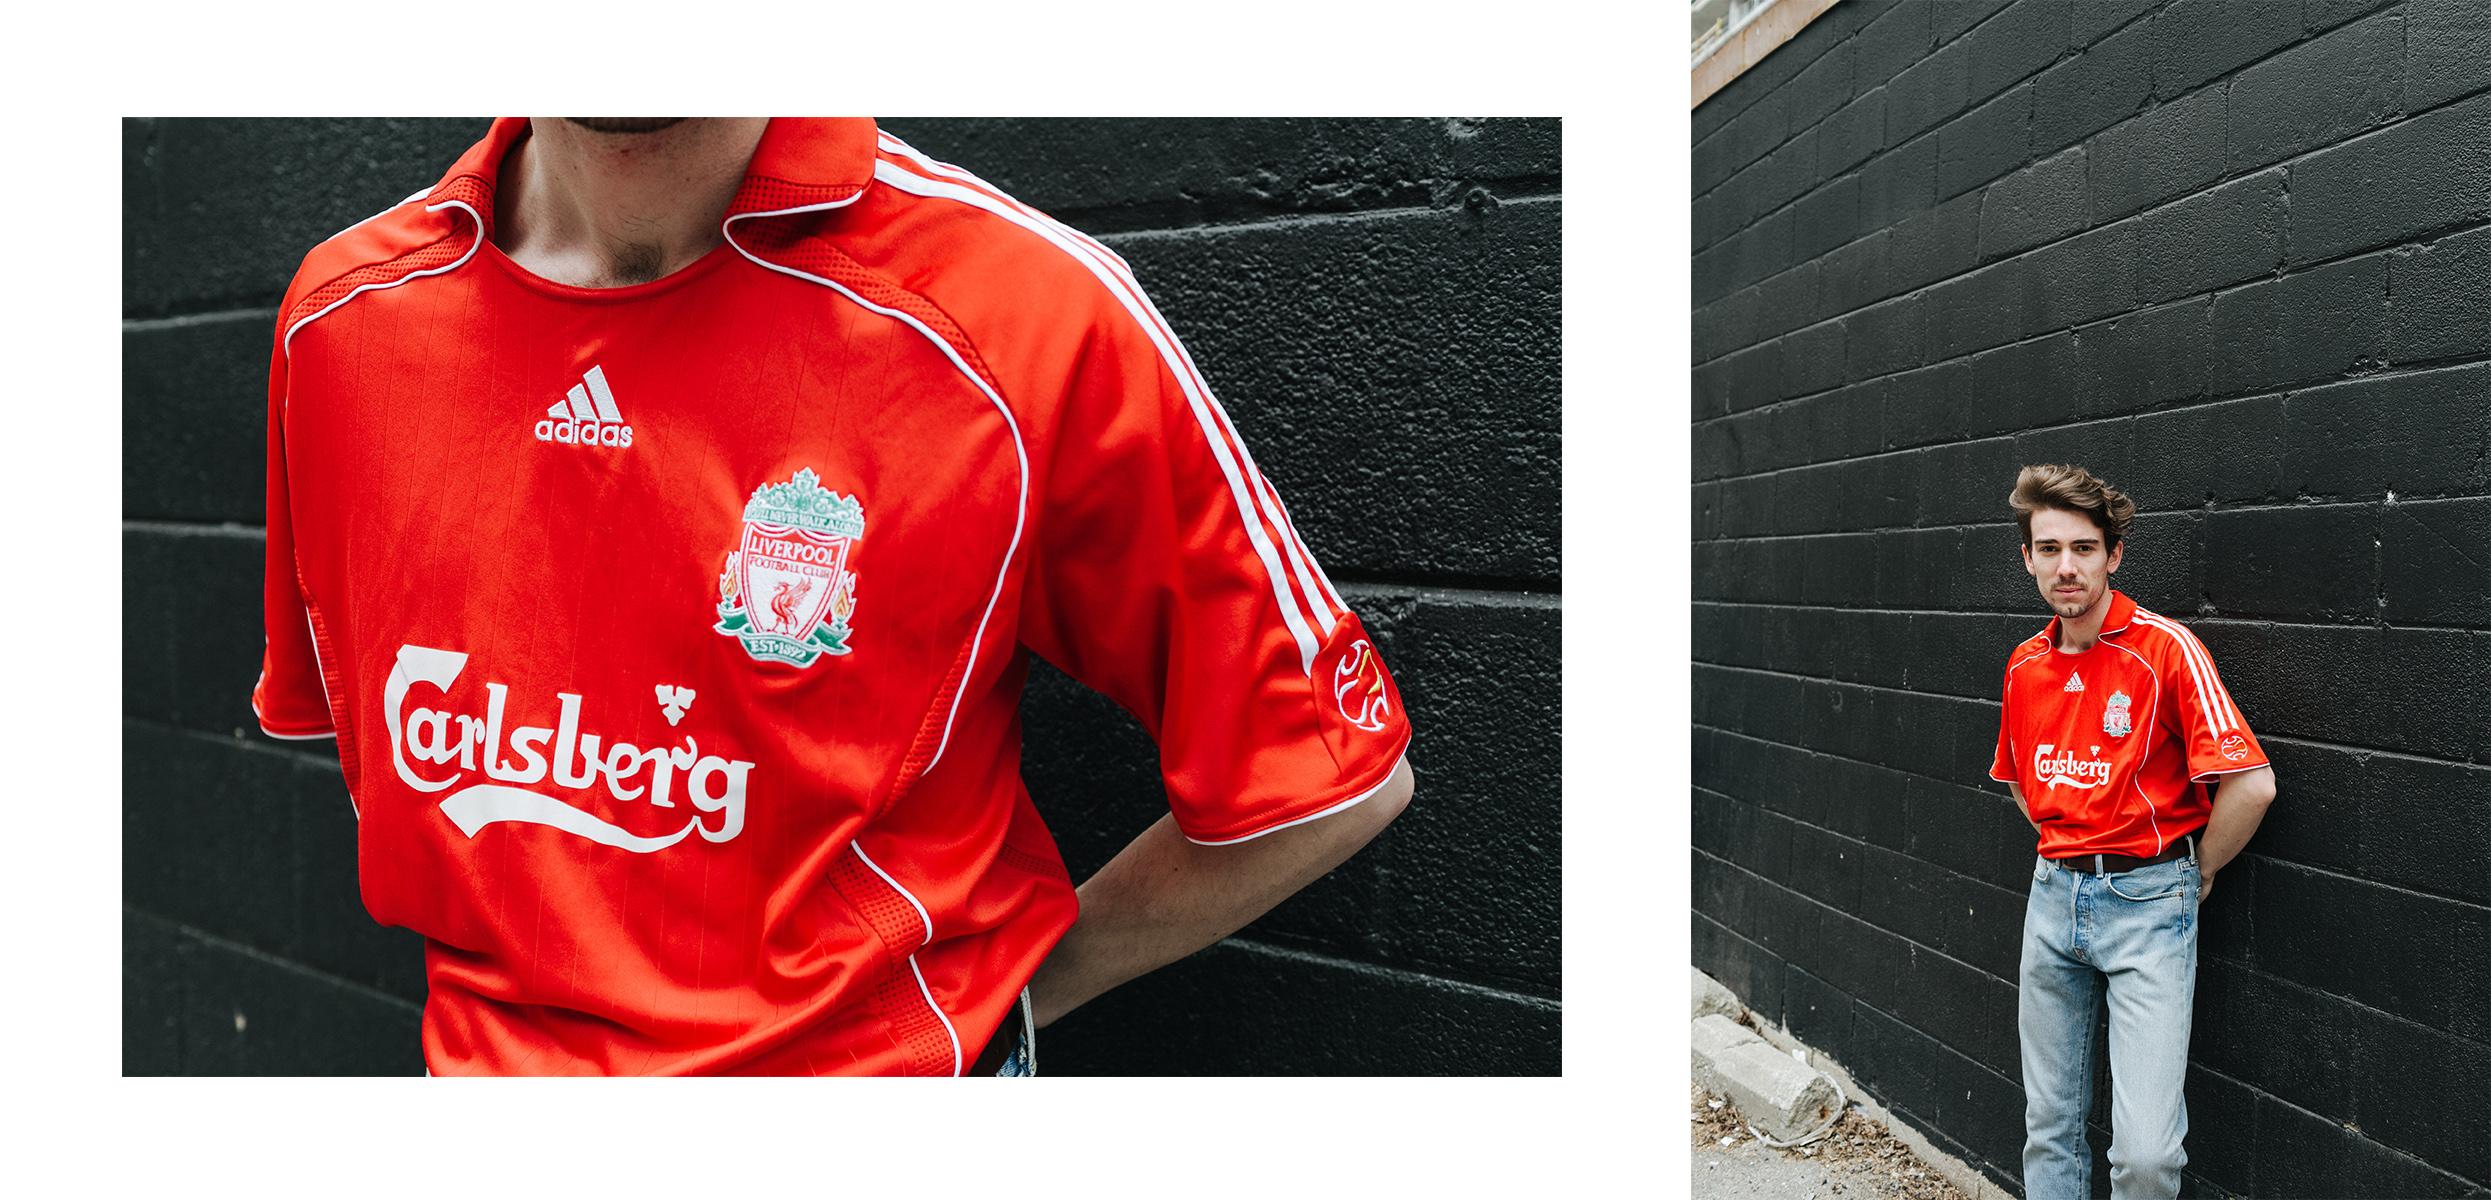 Liverpool-FC-2007-2008.jpg